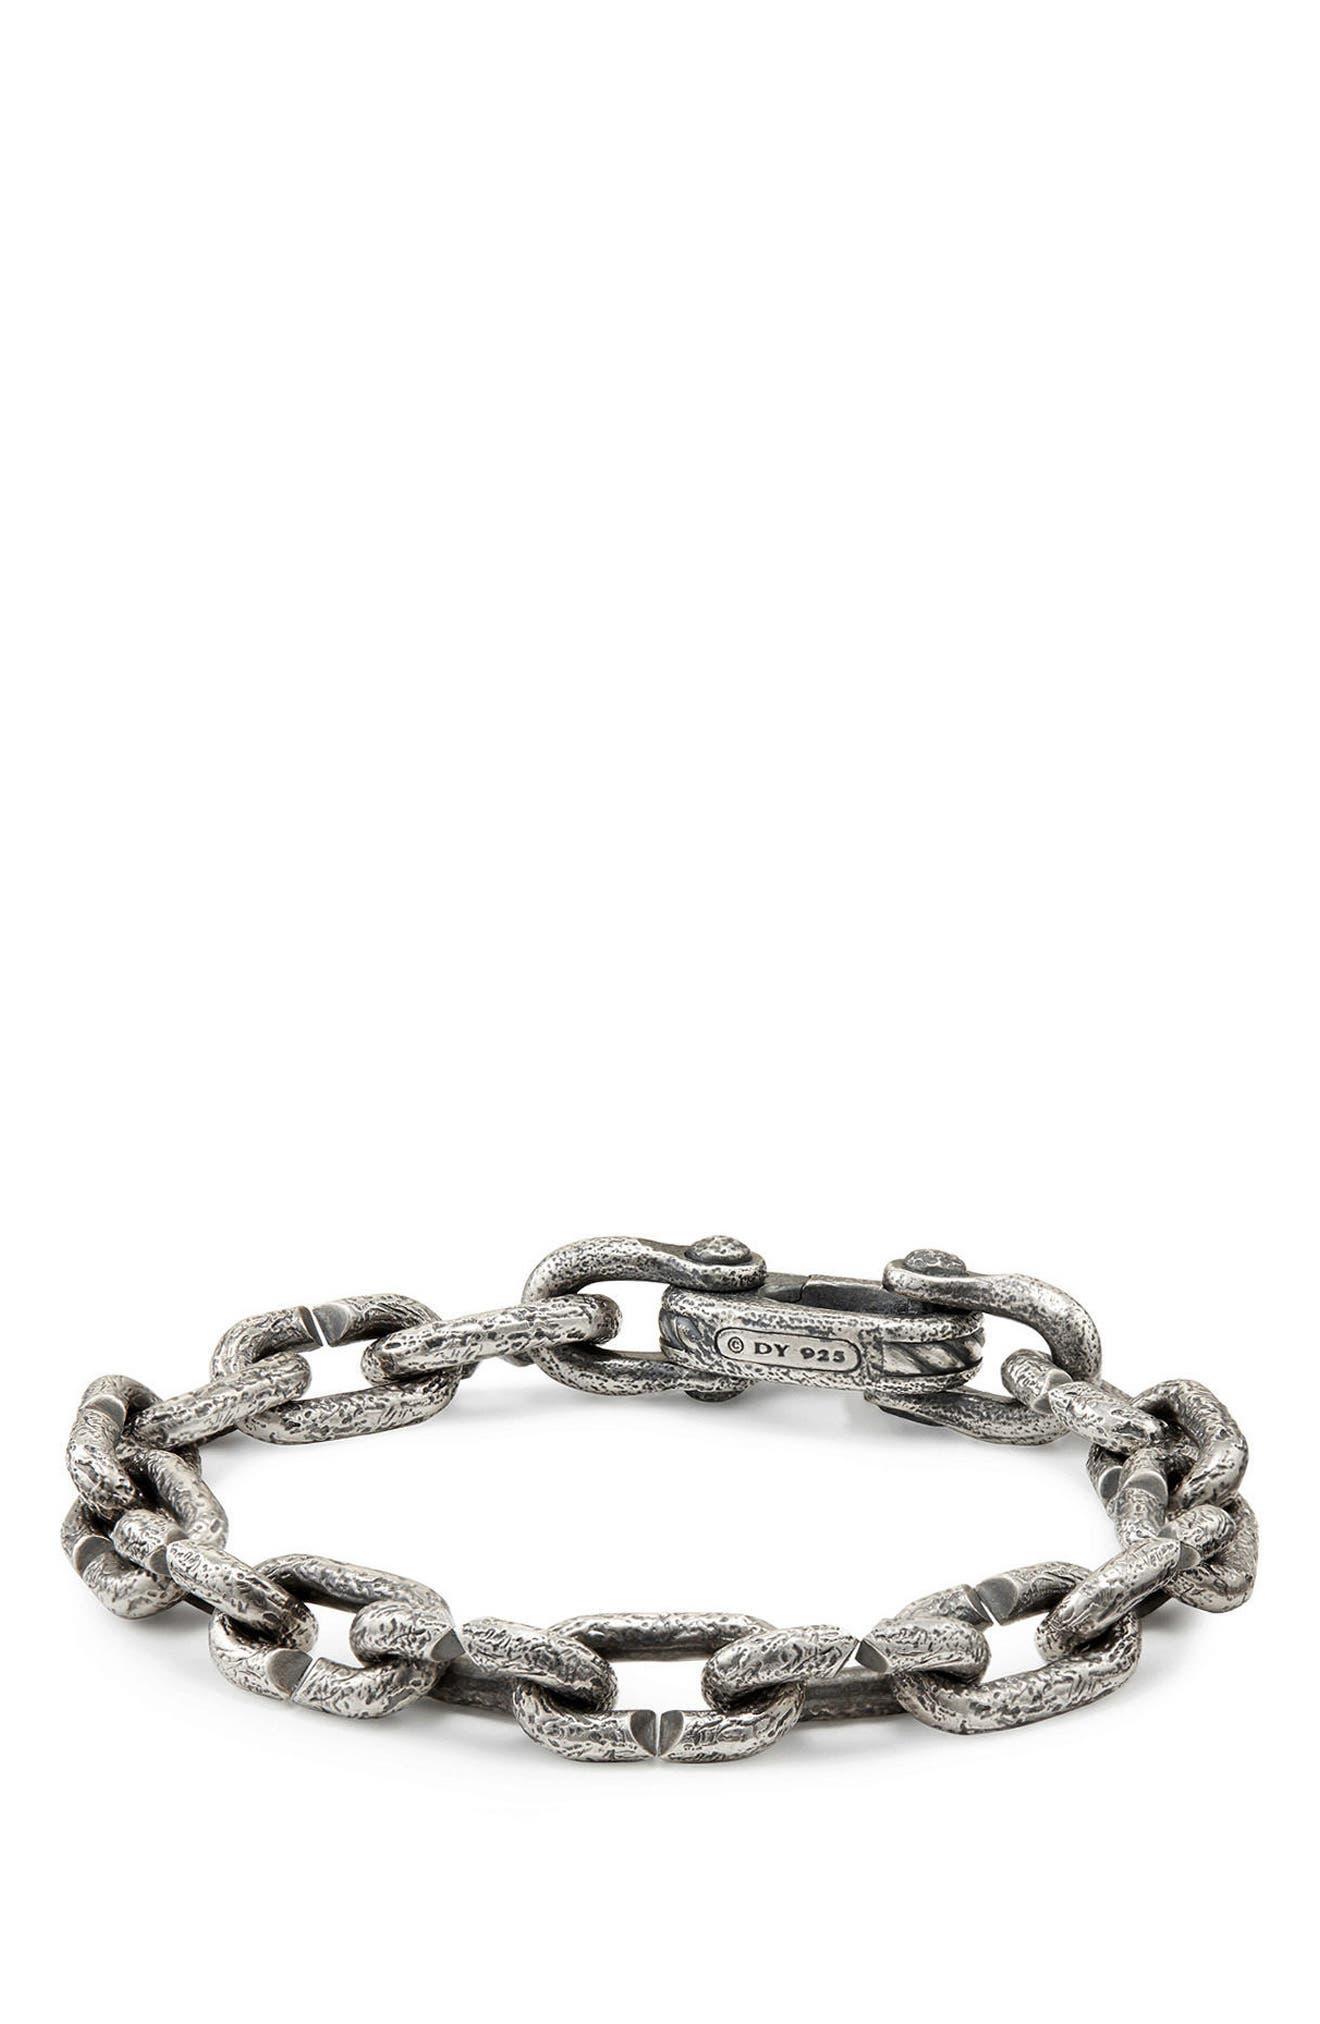 Shipwreck Chain Bracelet,                             Main thumbnail 1, color,                             SILVER